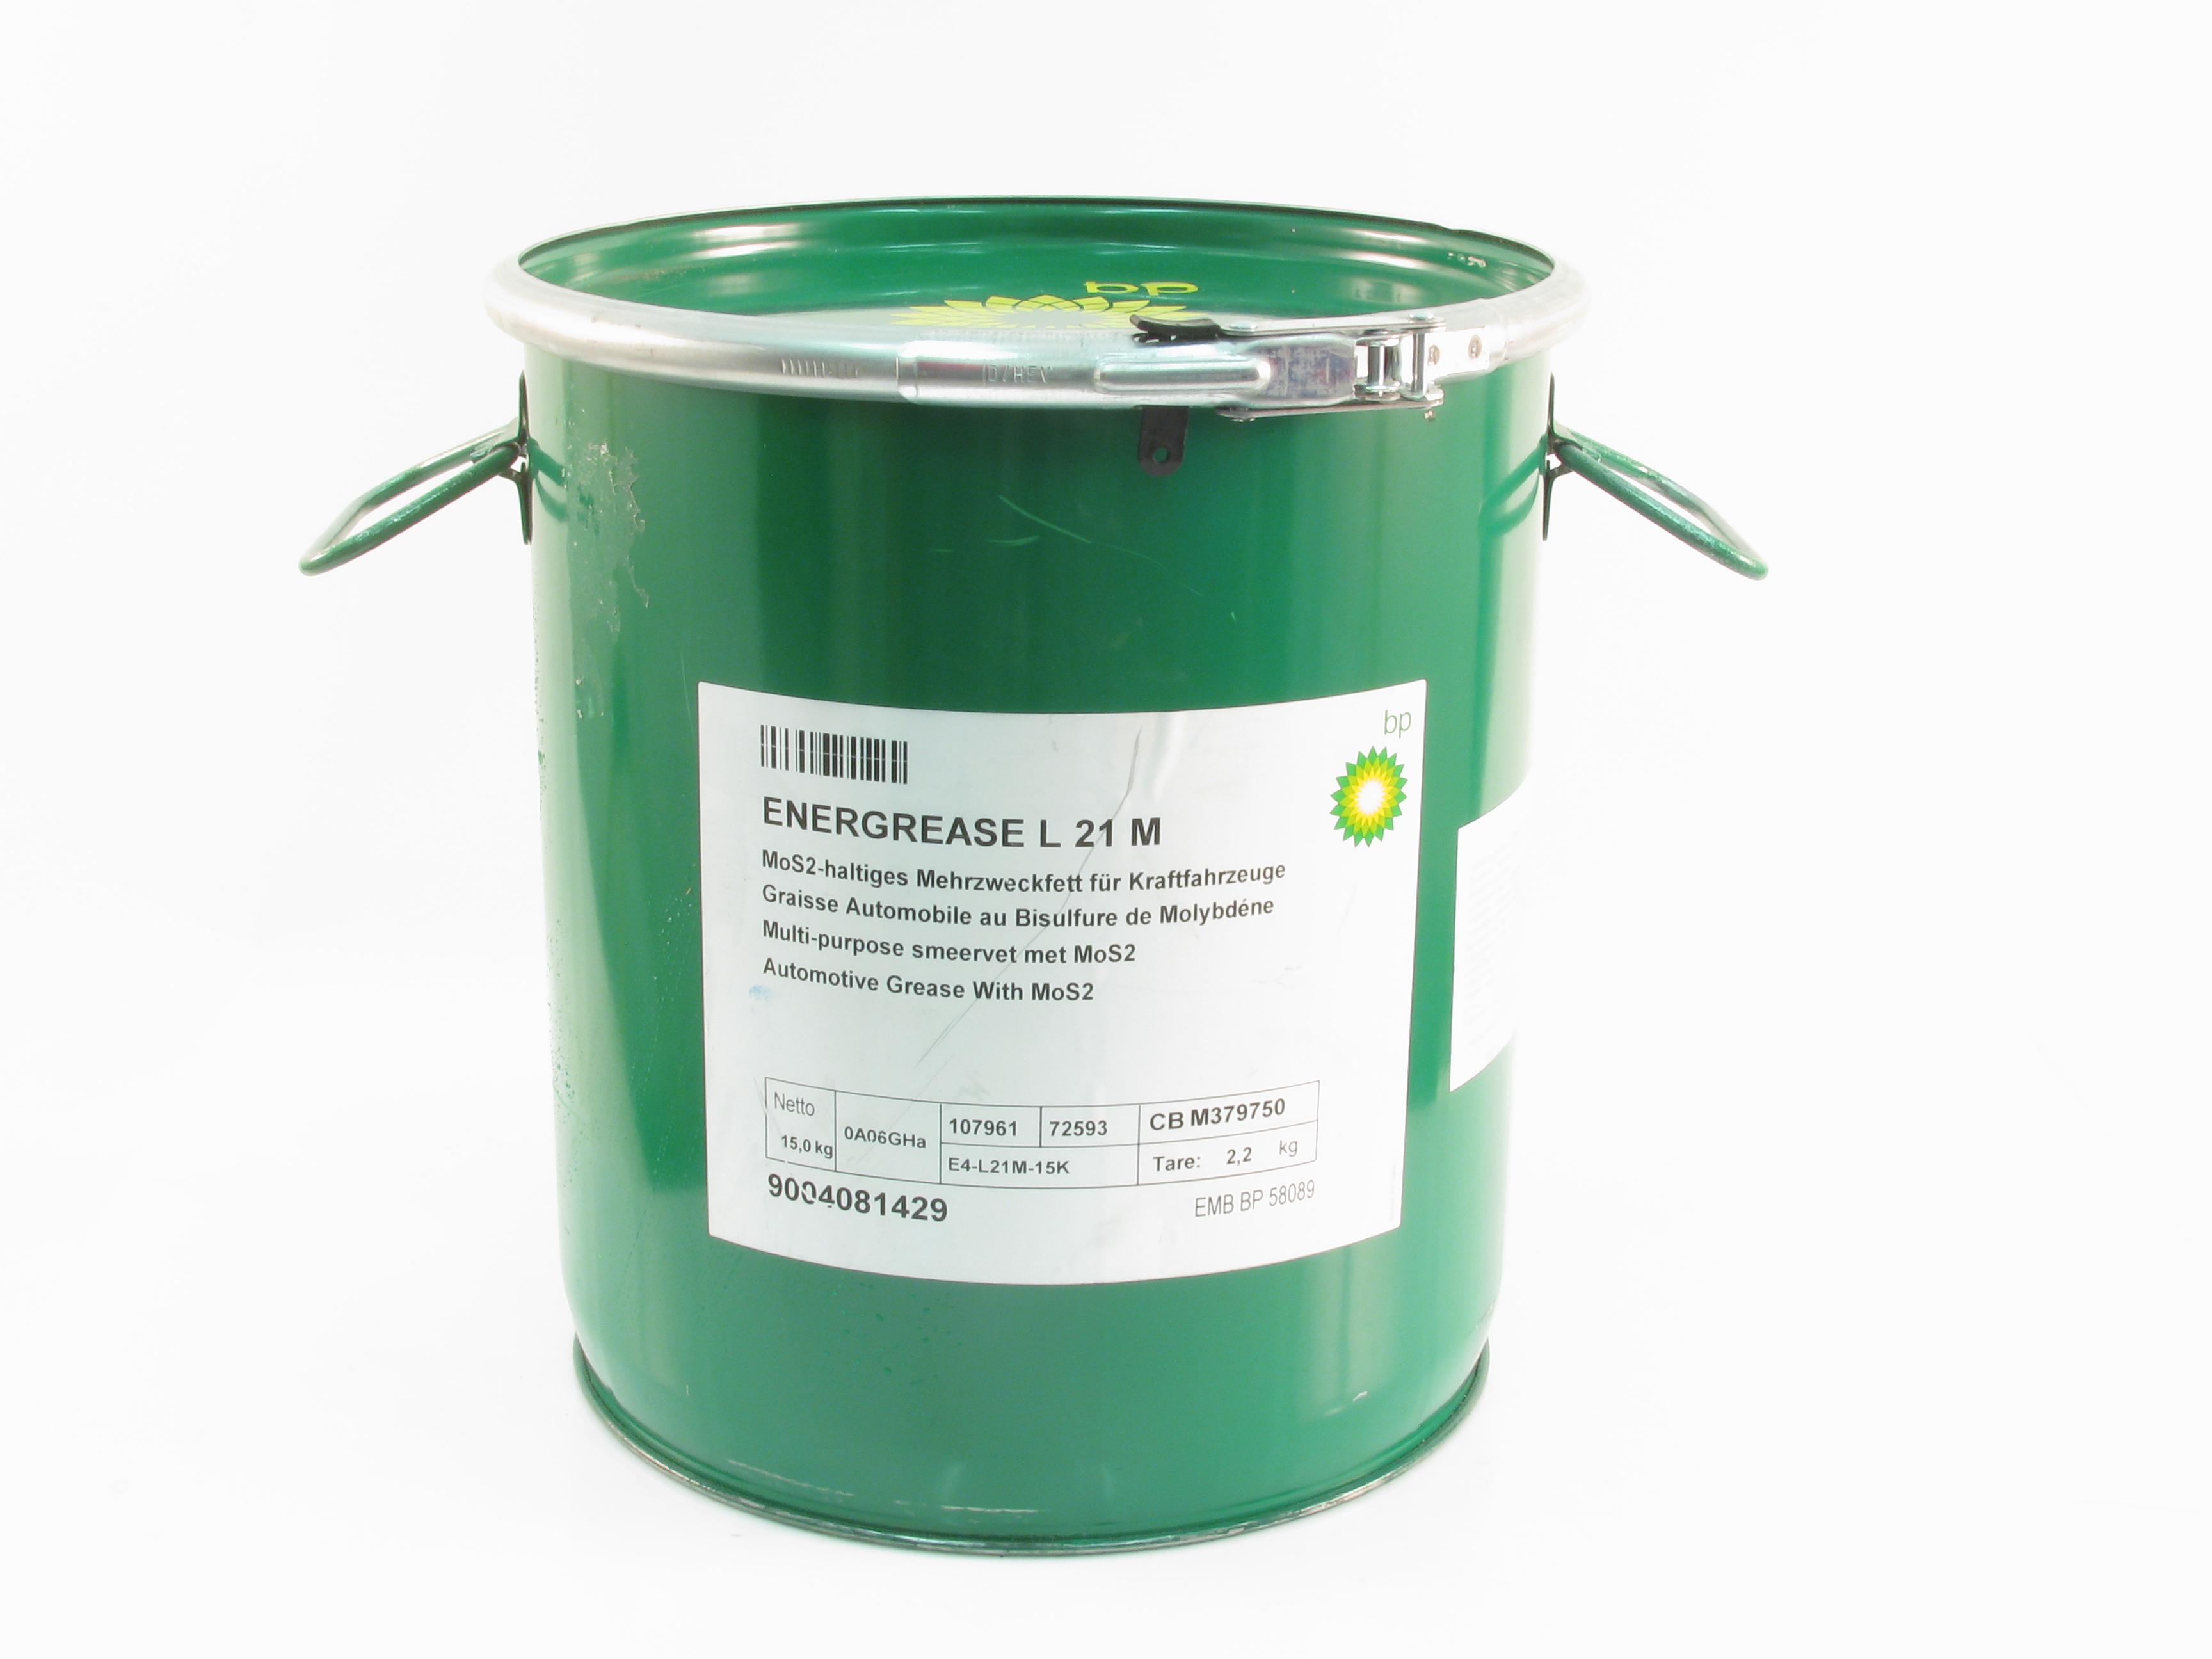 VASELINA BP ENERGREASE L21 M 15KG